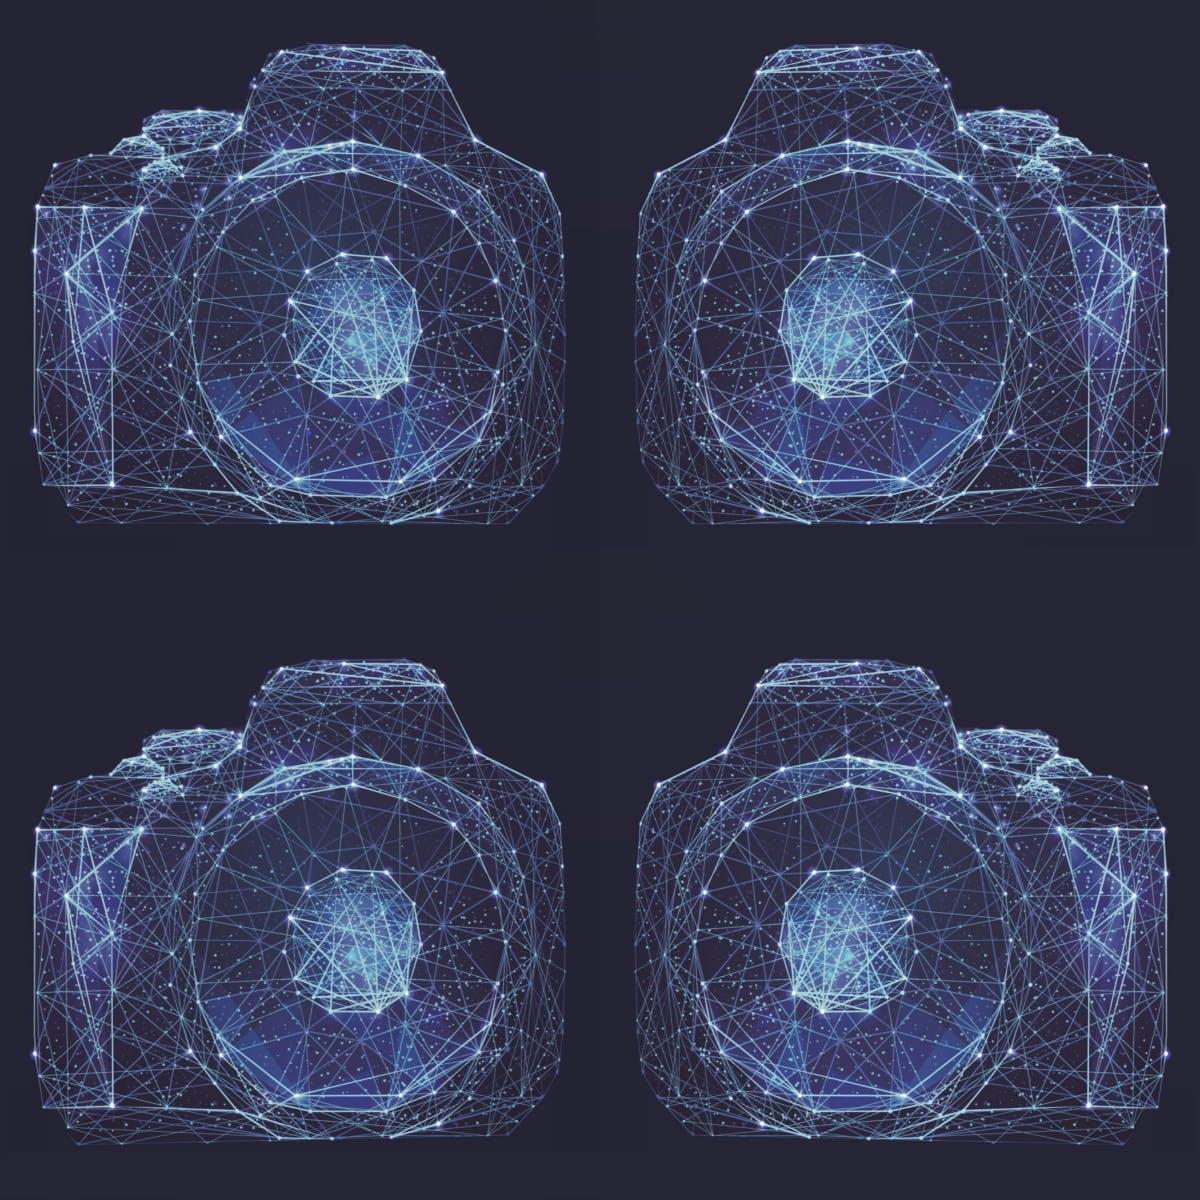 Stereo Vision, Dense Motion & Tracking